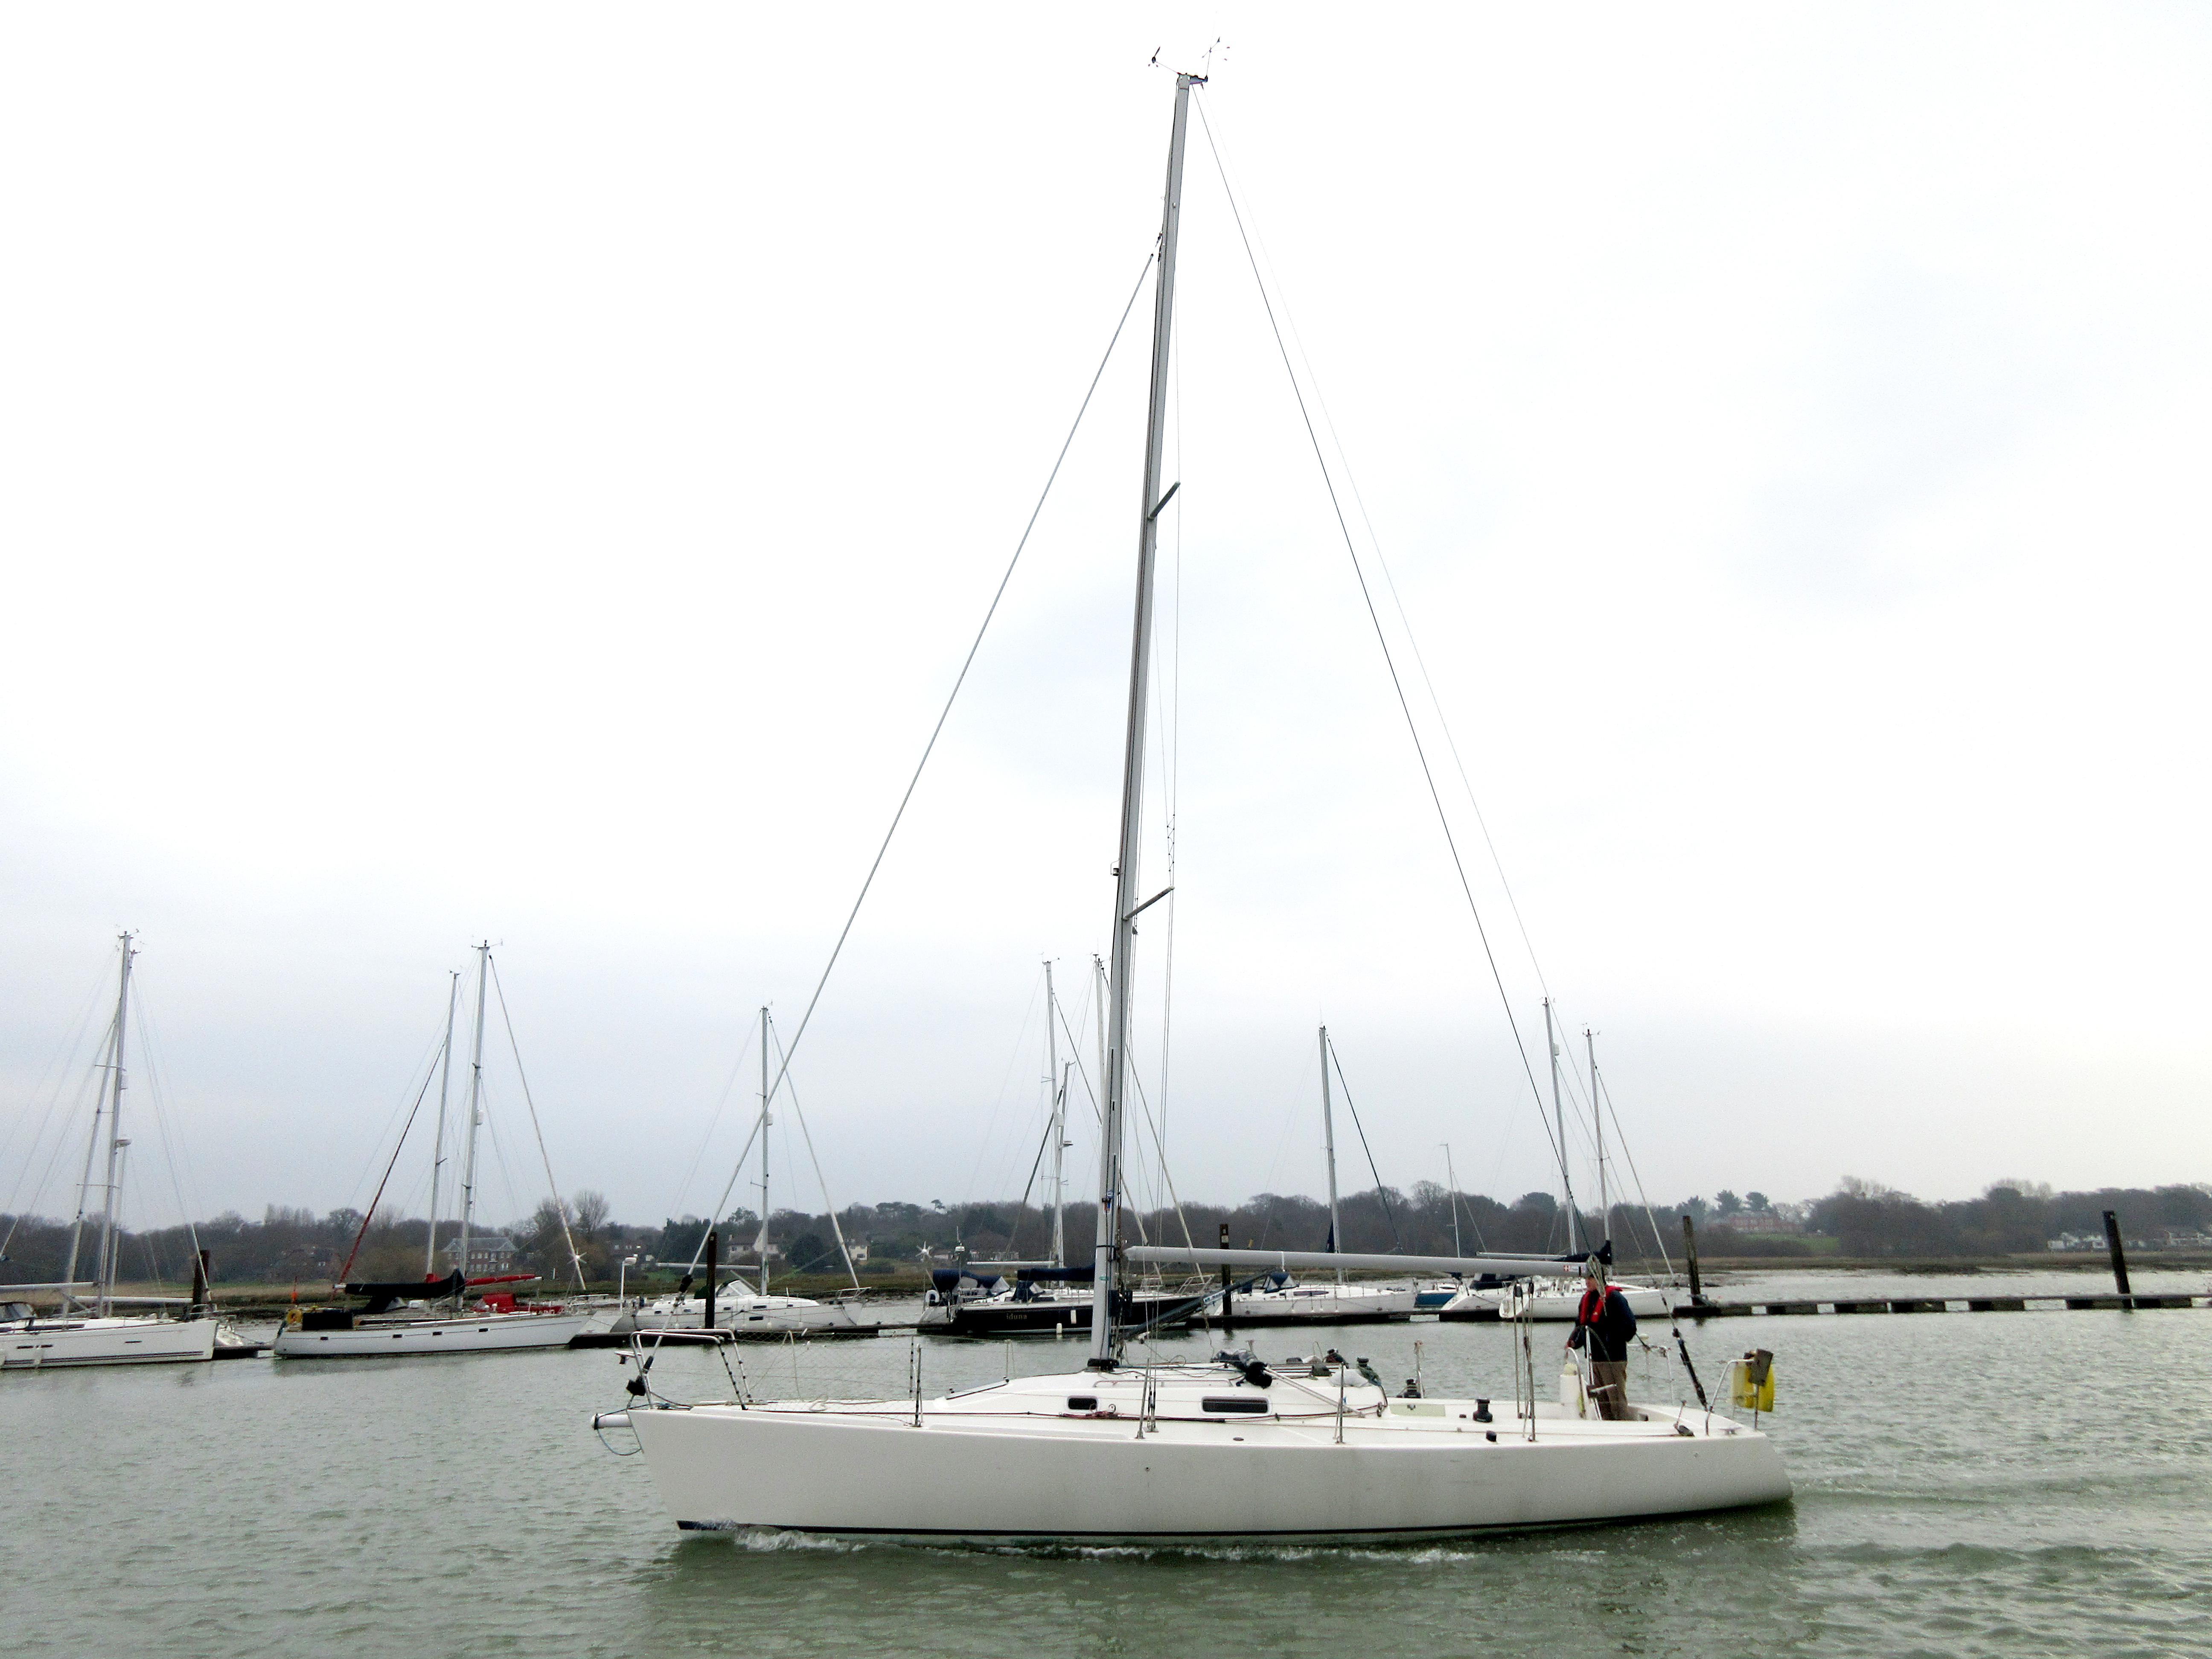 Used J Boats J 105 boats for sale - boats.com